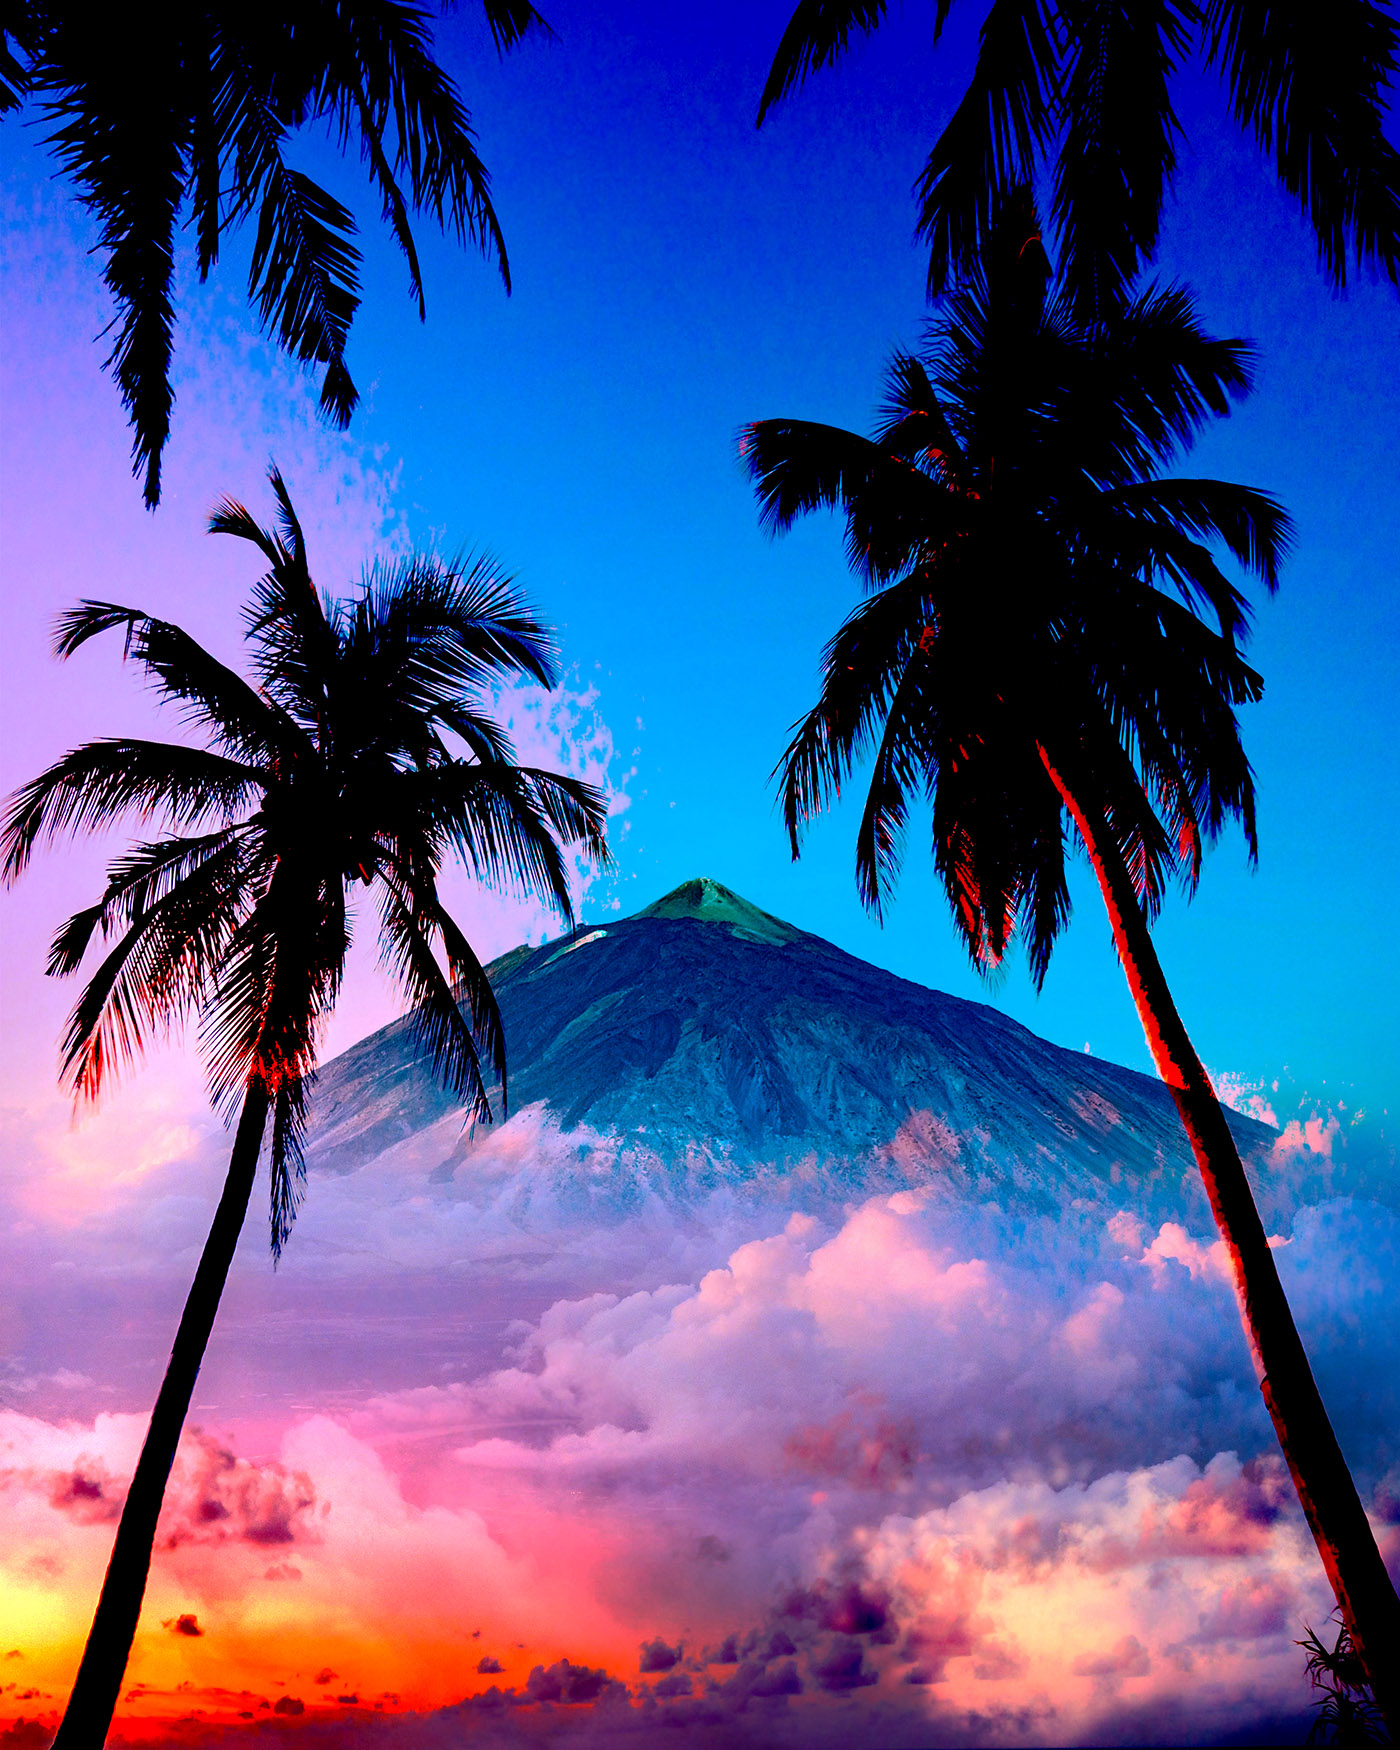 Beautiful Caribbean Paradise 01 - Royalty-Free Stock Imagery